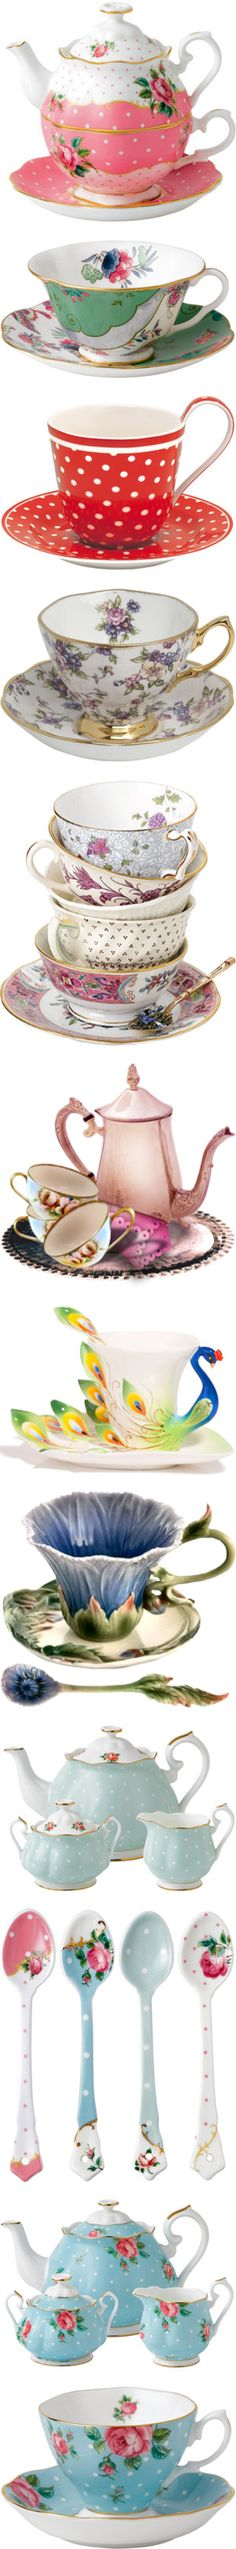 Tea Time by judymjohnson on Polyvore featuring home, kitchen & dining, teapots, food, tea, tea pot, bone china, vintage bone china, rose tea pot and royal albert tea pot